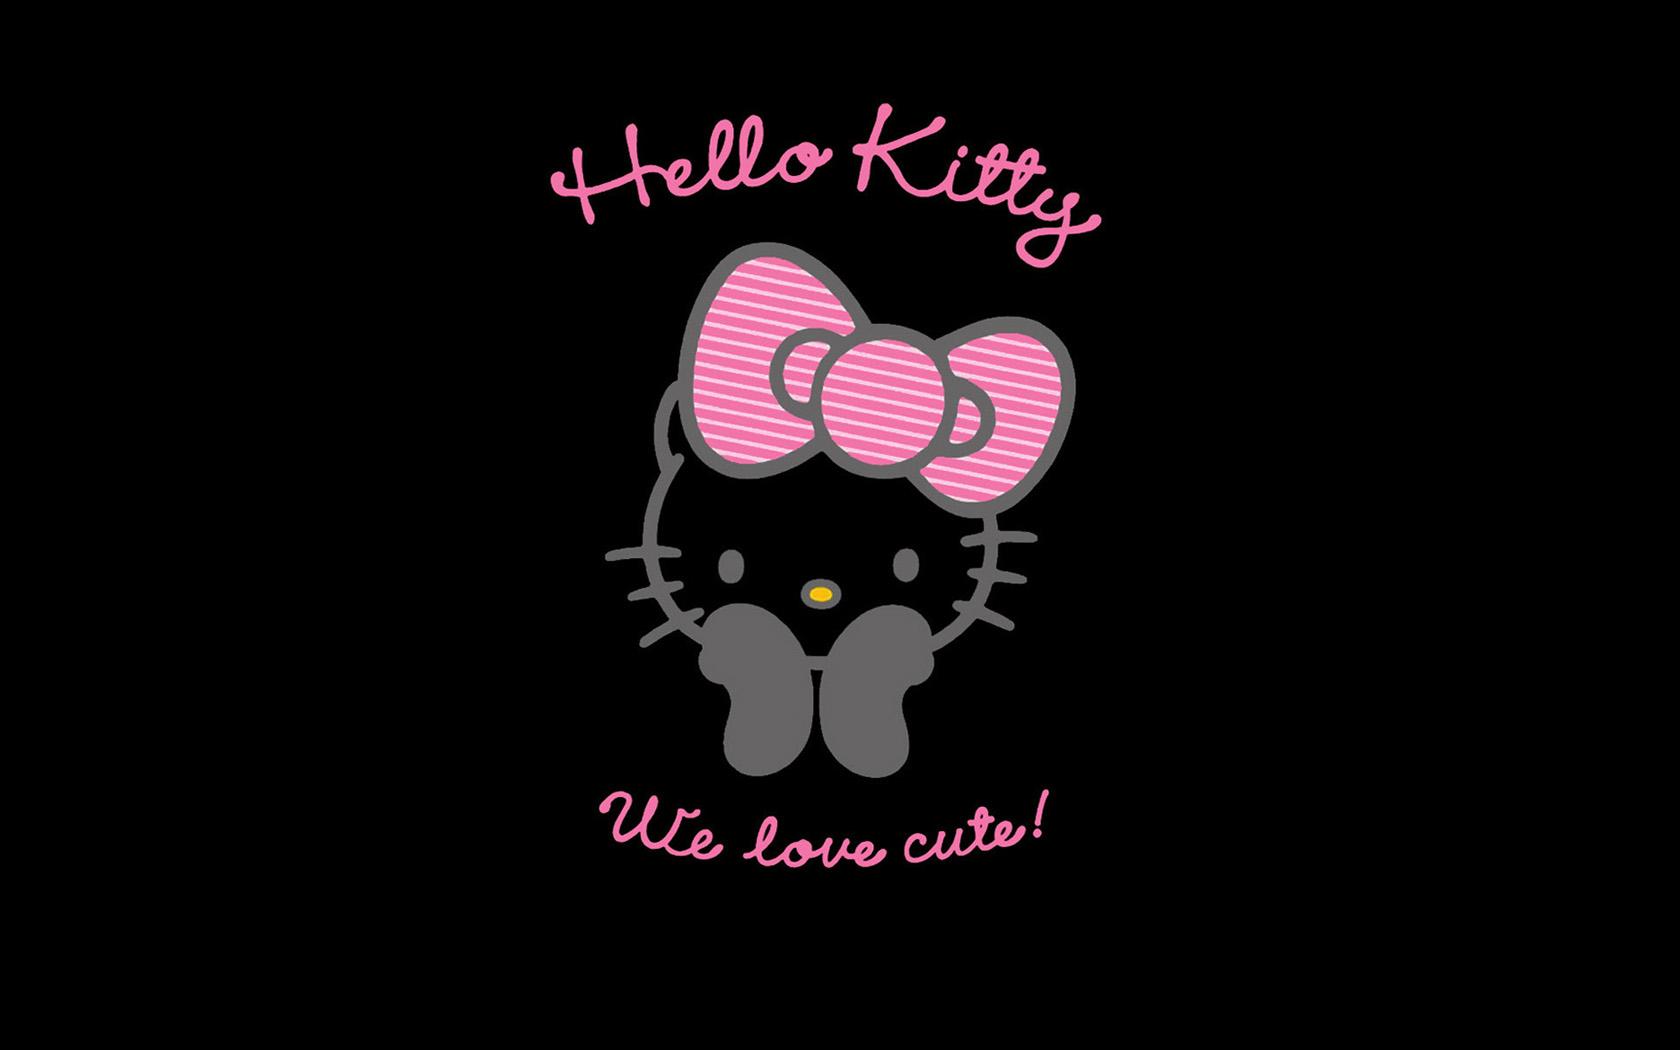 Hello Kitty Wallpapers 18, HD Wallpaper Downloads